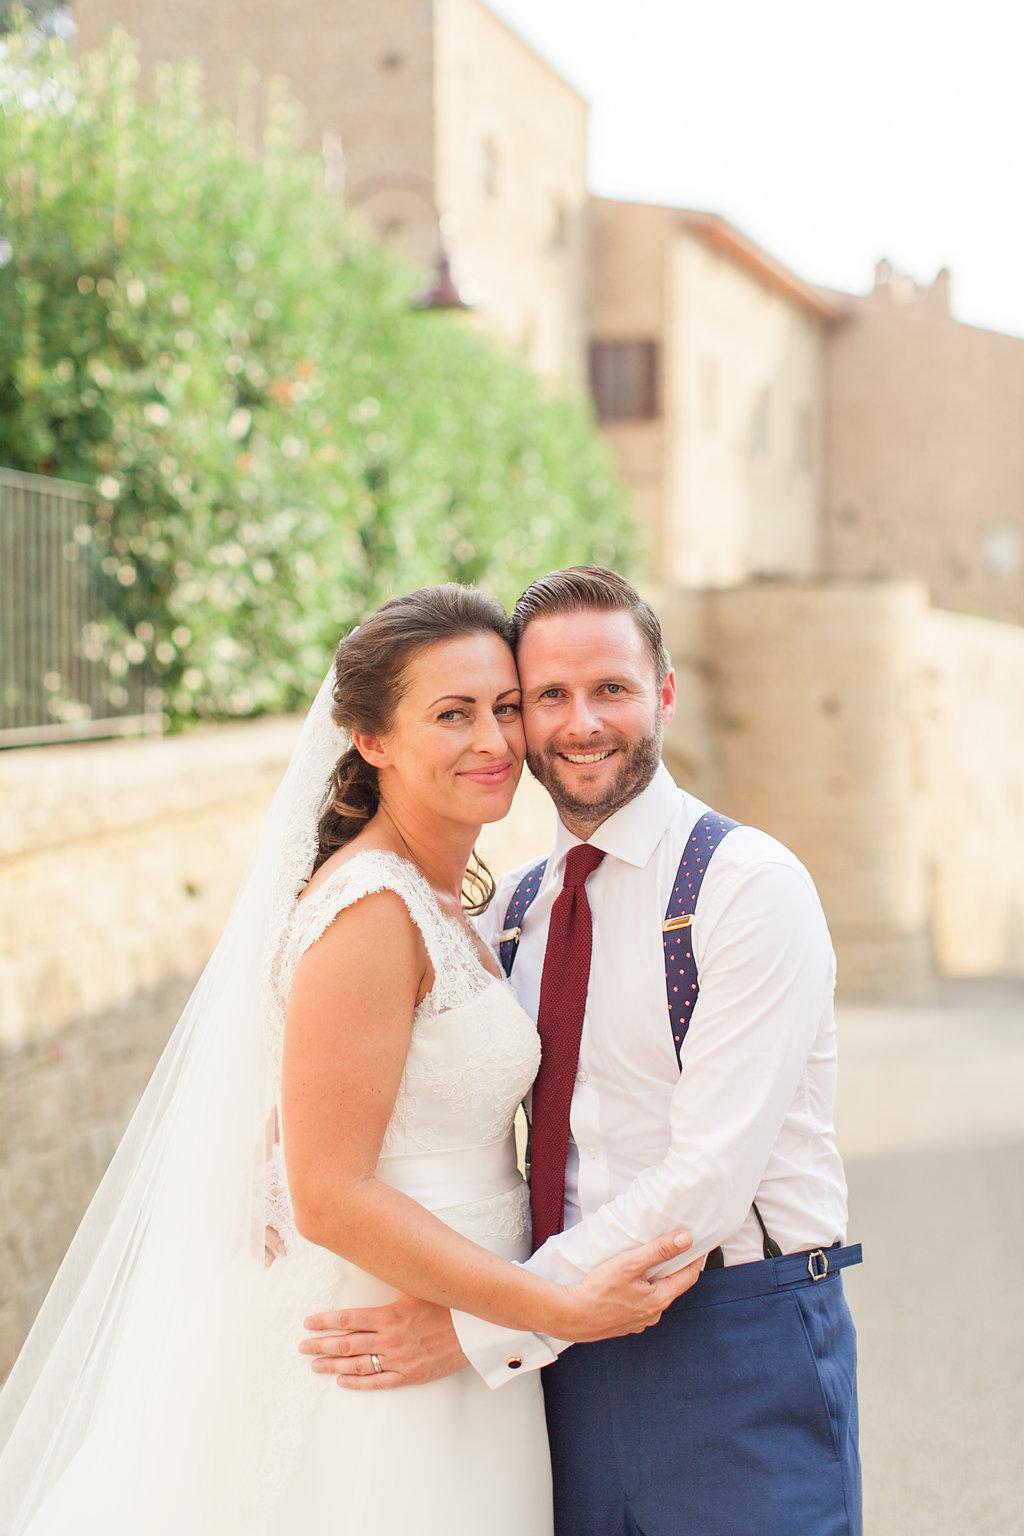 castelfalfi-tuscany-wedding-photographer-roberta-facchini-355